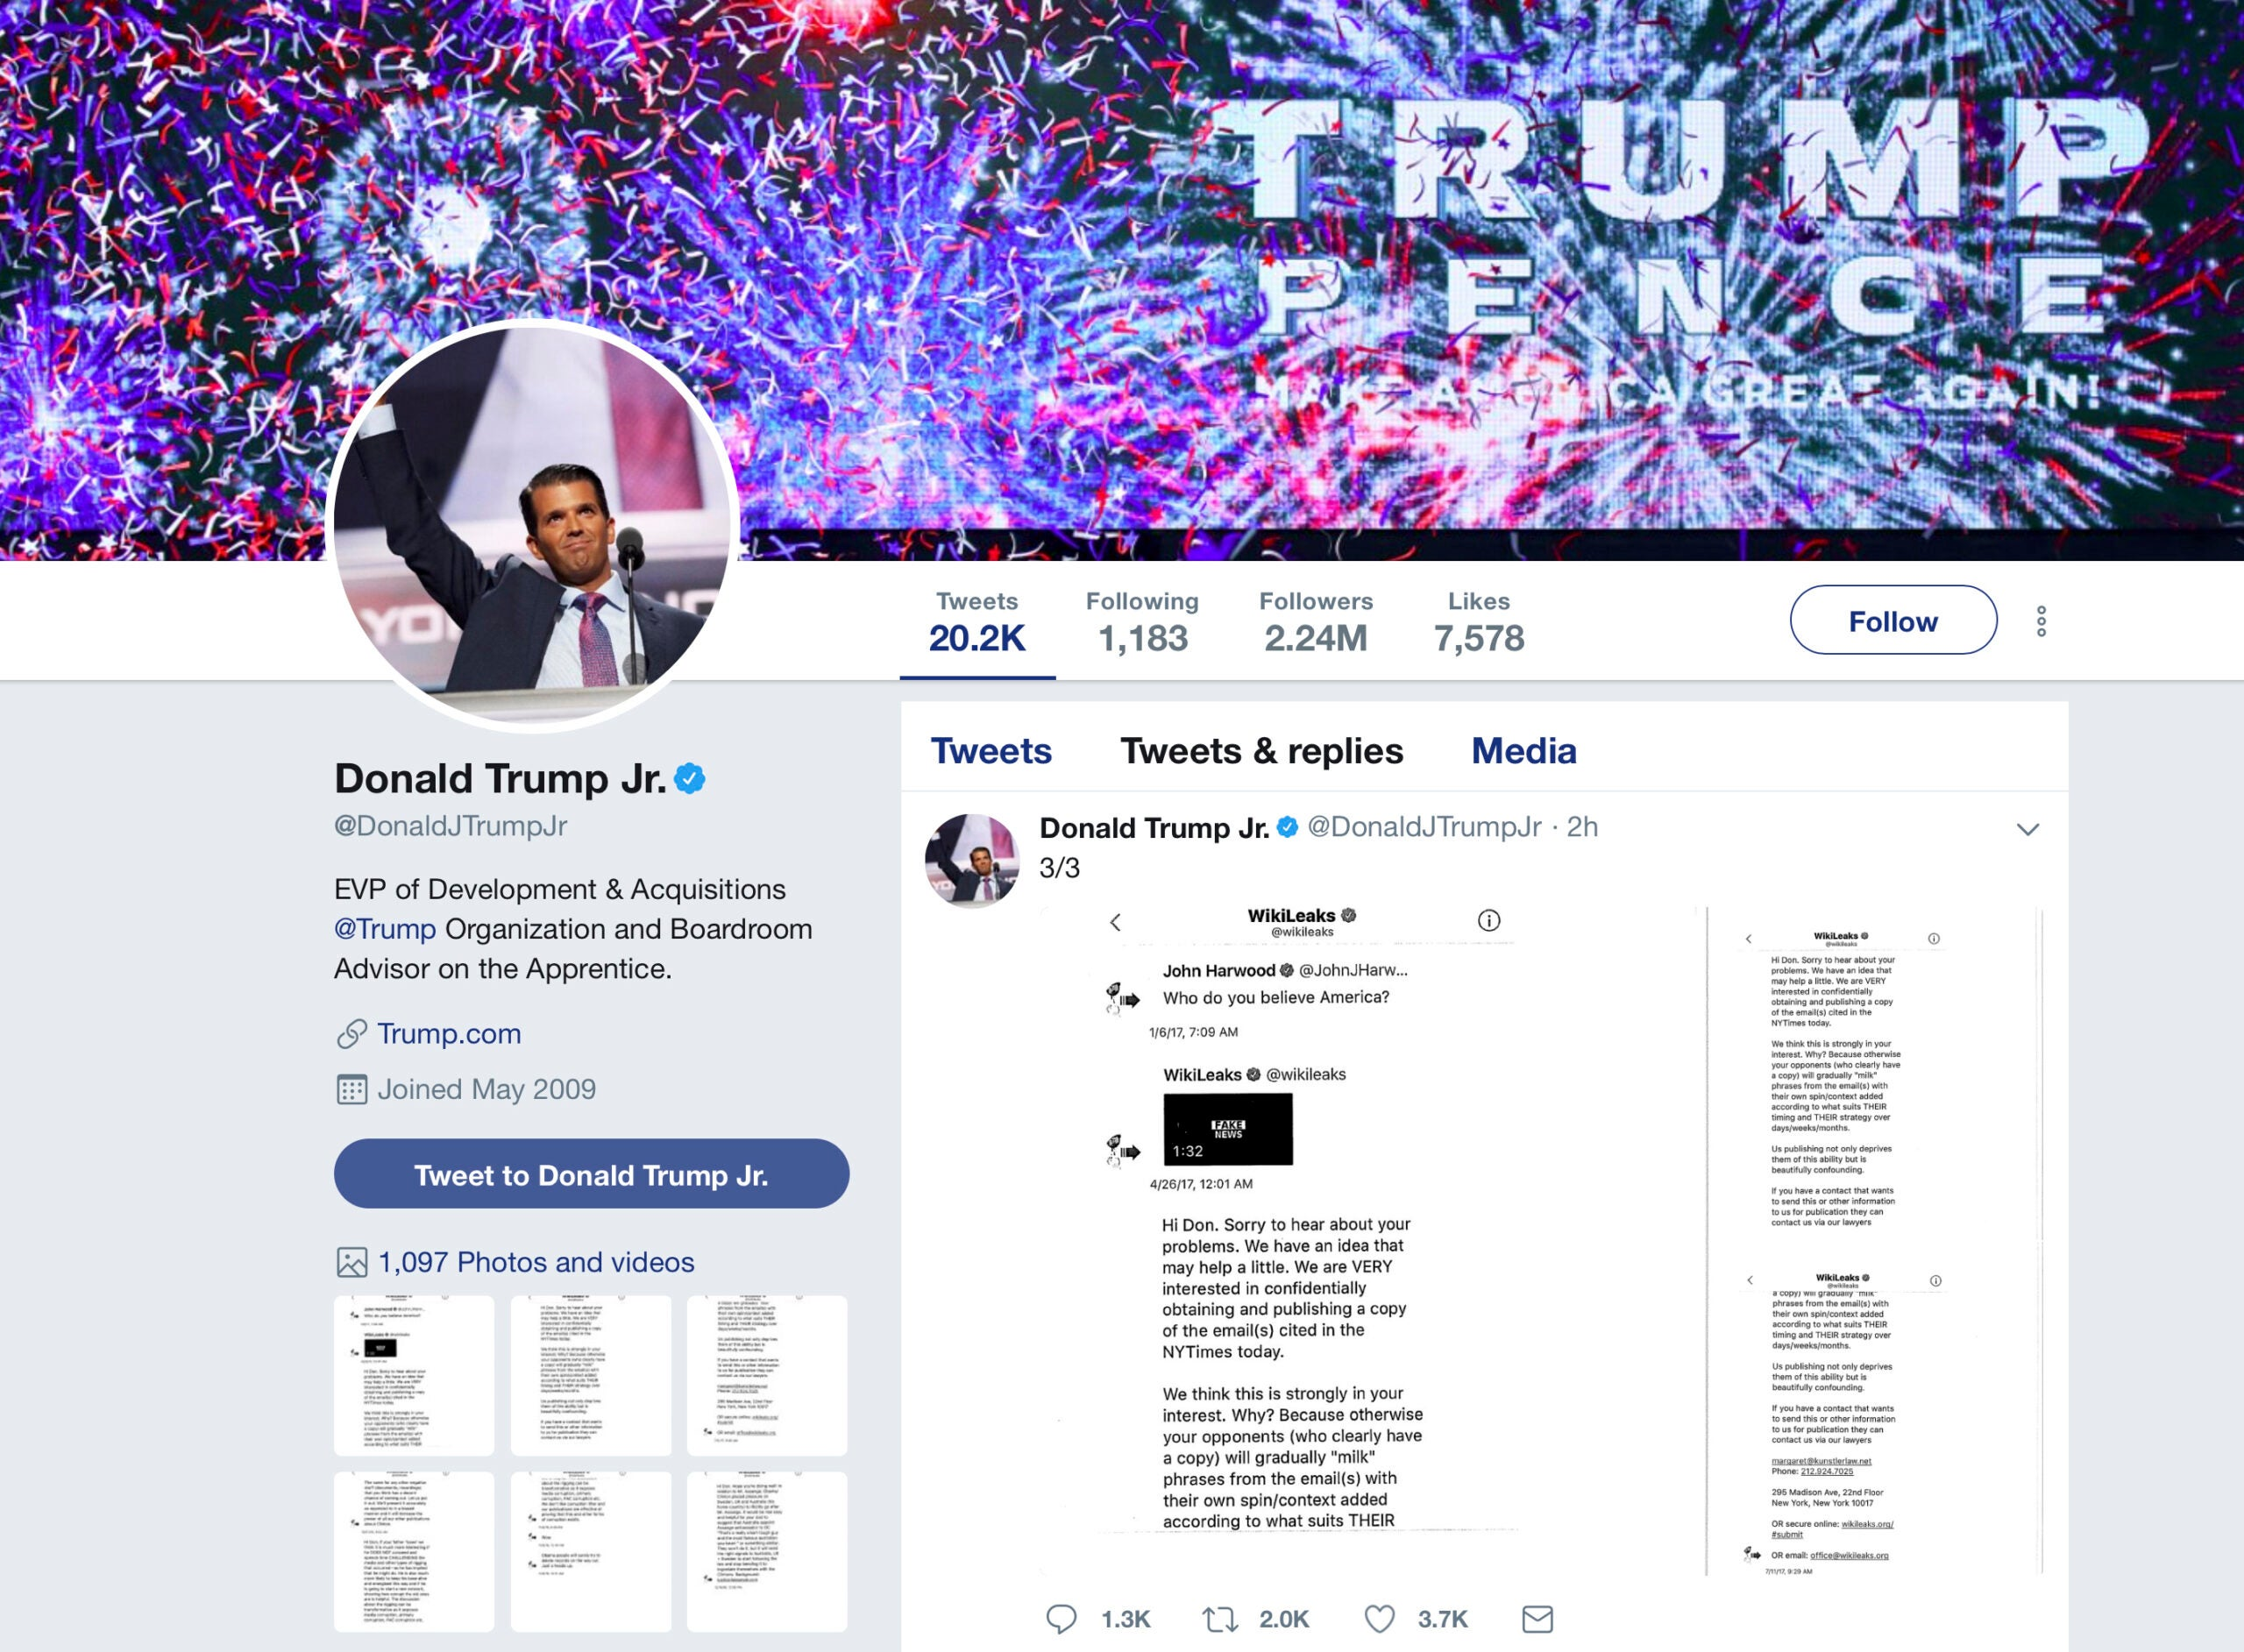 Donald Trump Jr.'s Twitter